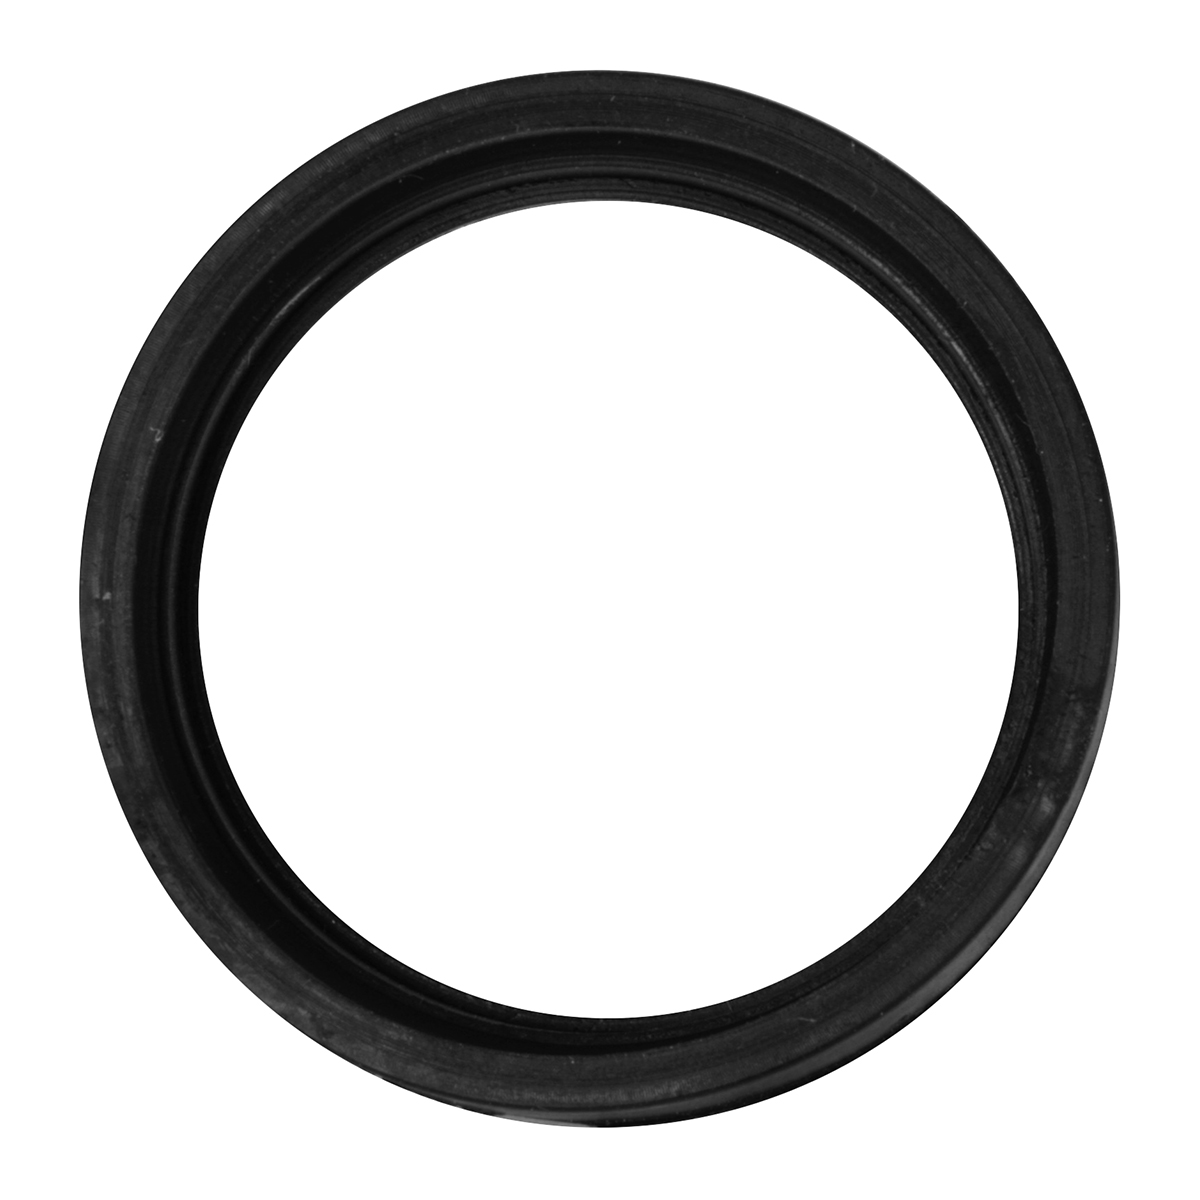 80460 Pete Dome Light Lens Adapter/Grommet